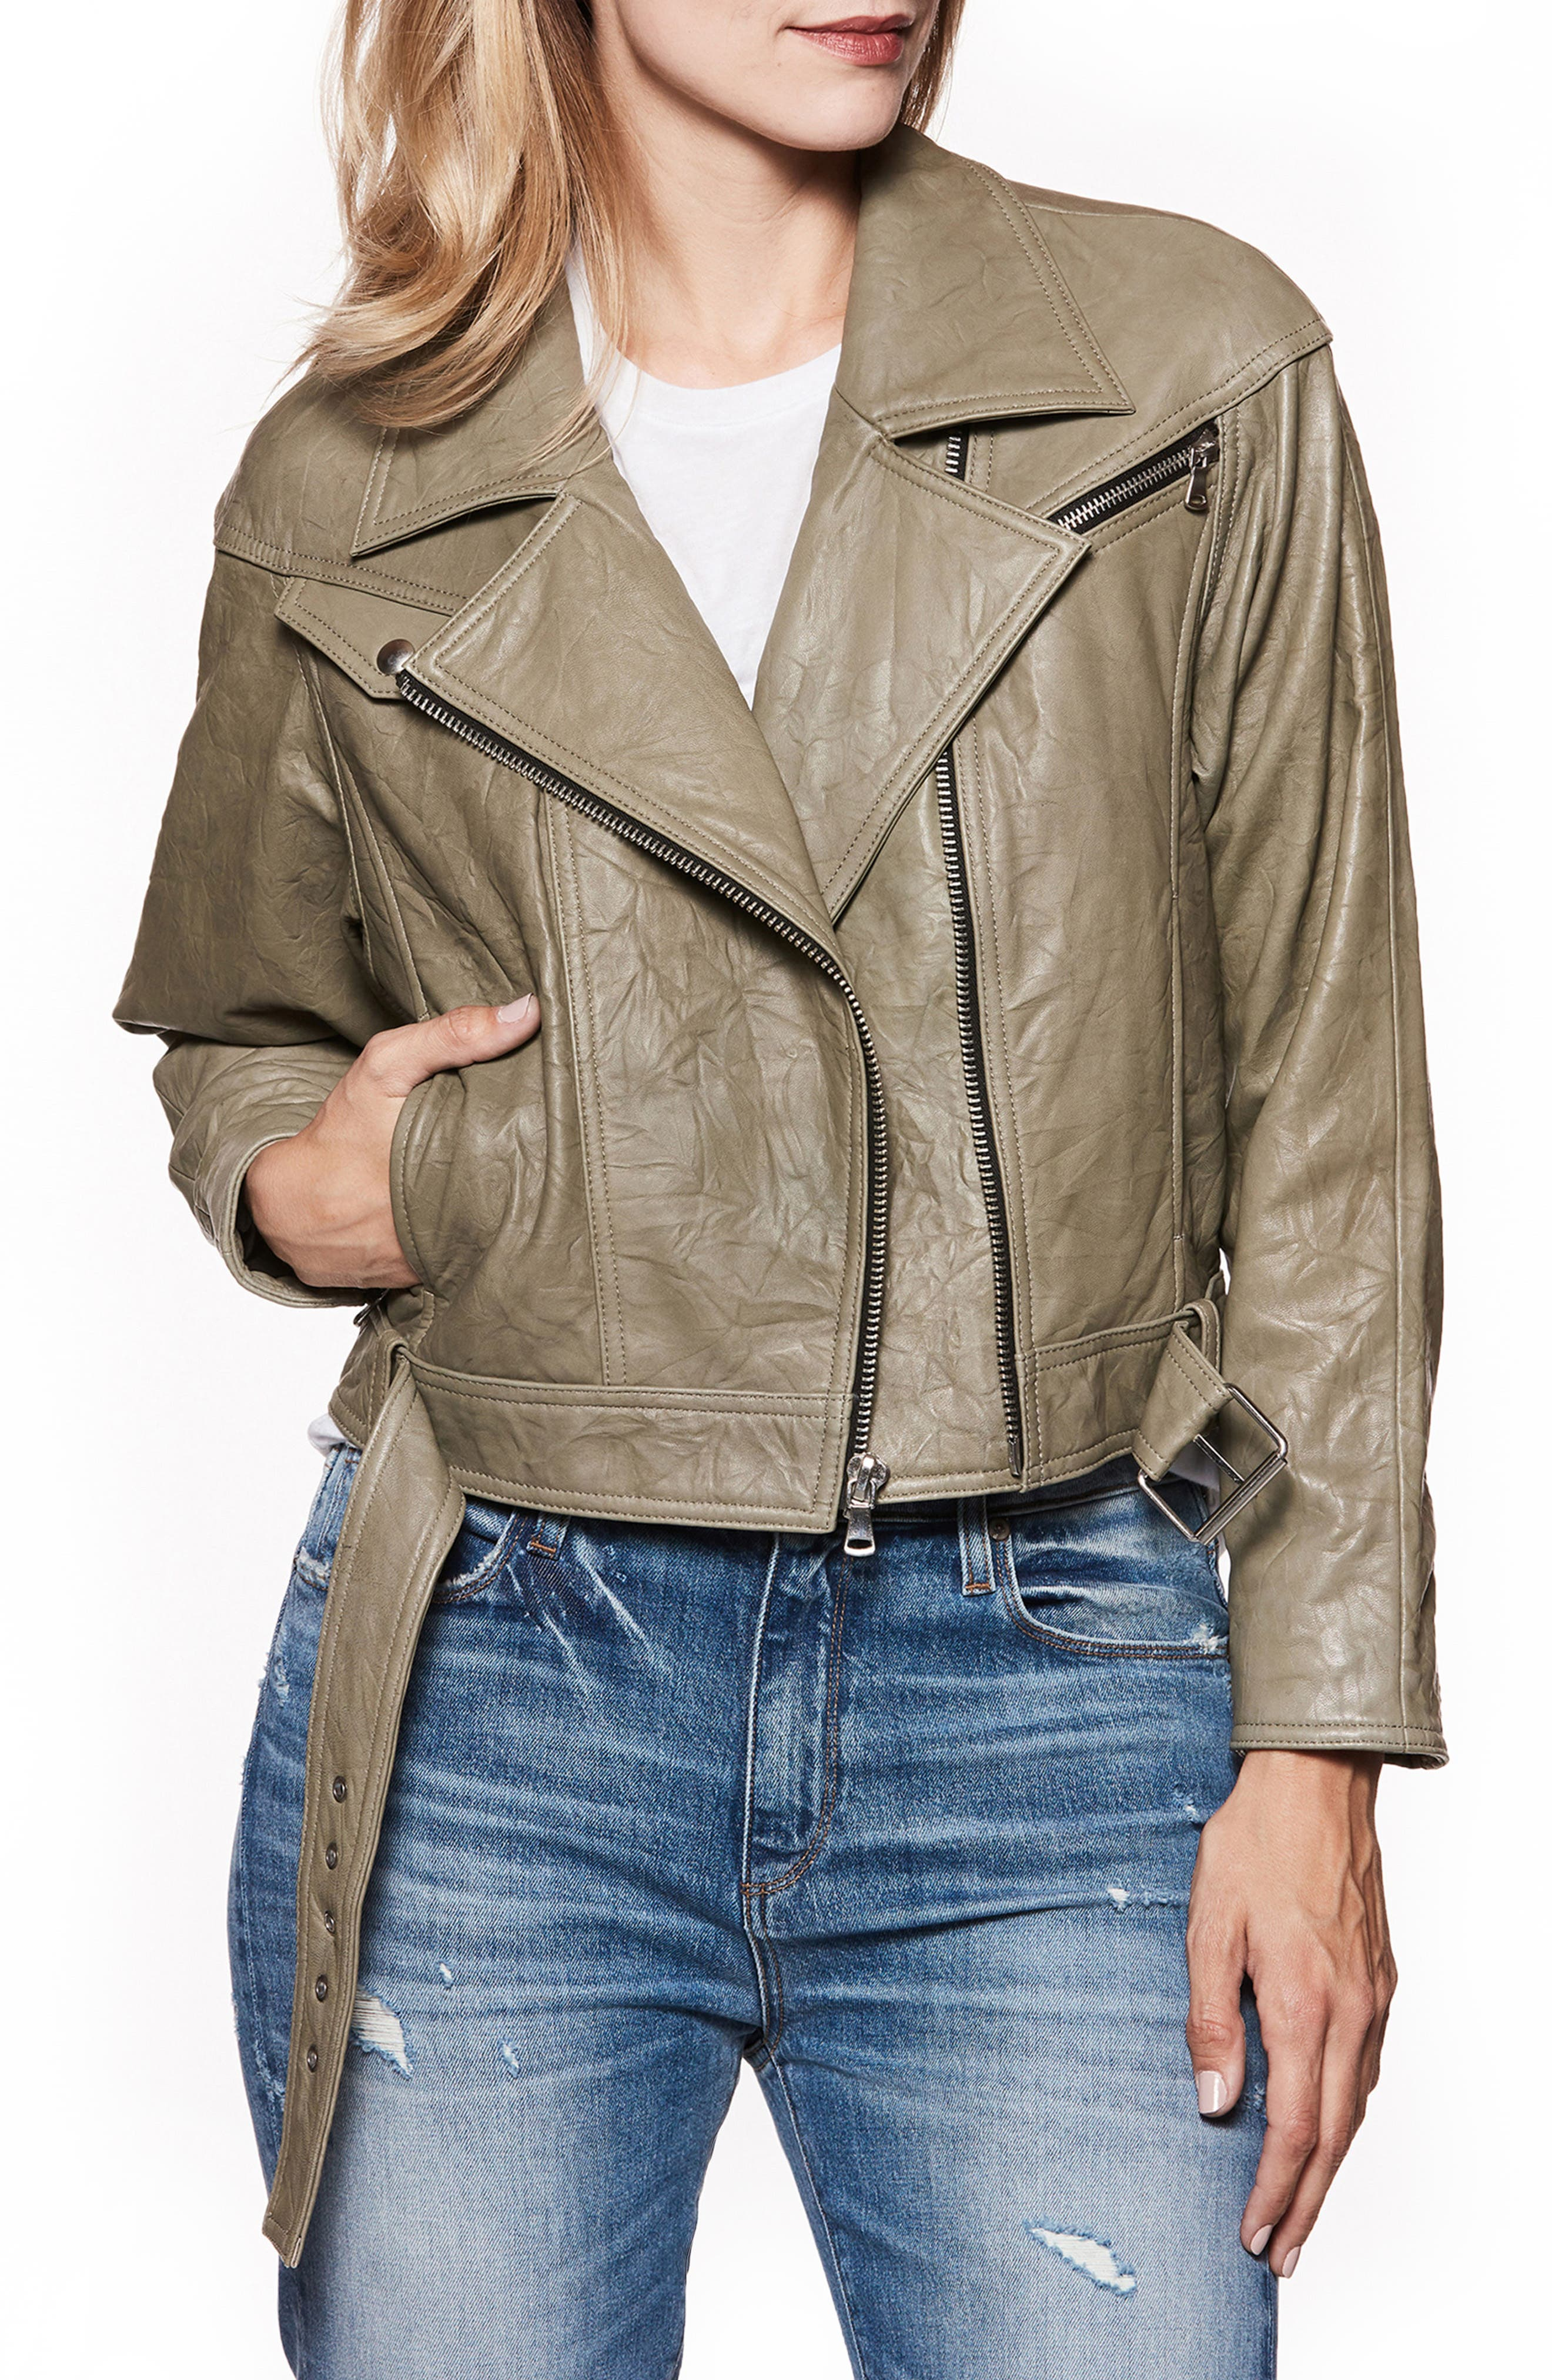 Sivan Leather Moto Jacket,                             Main thumbnail 1, color,                             300